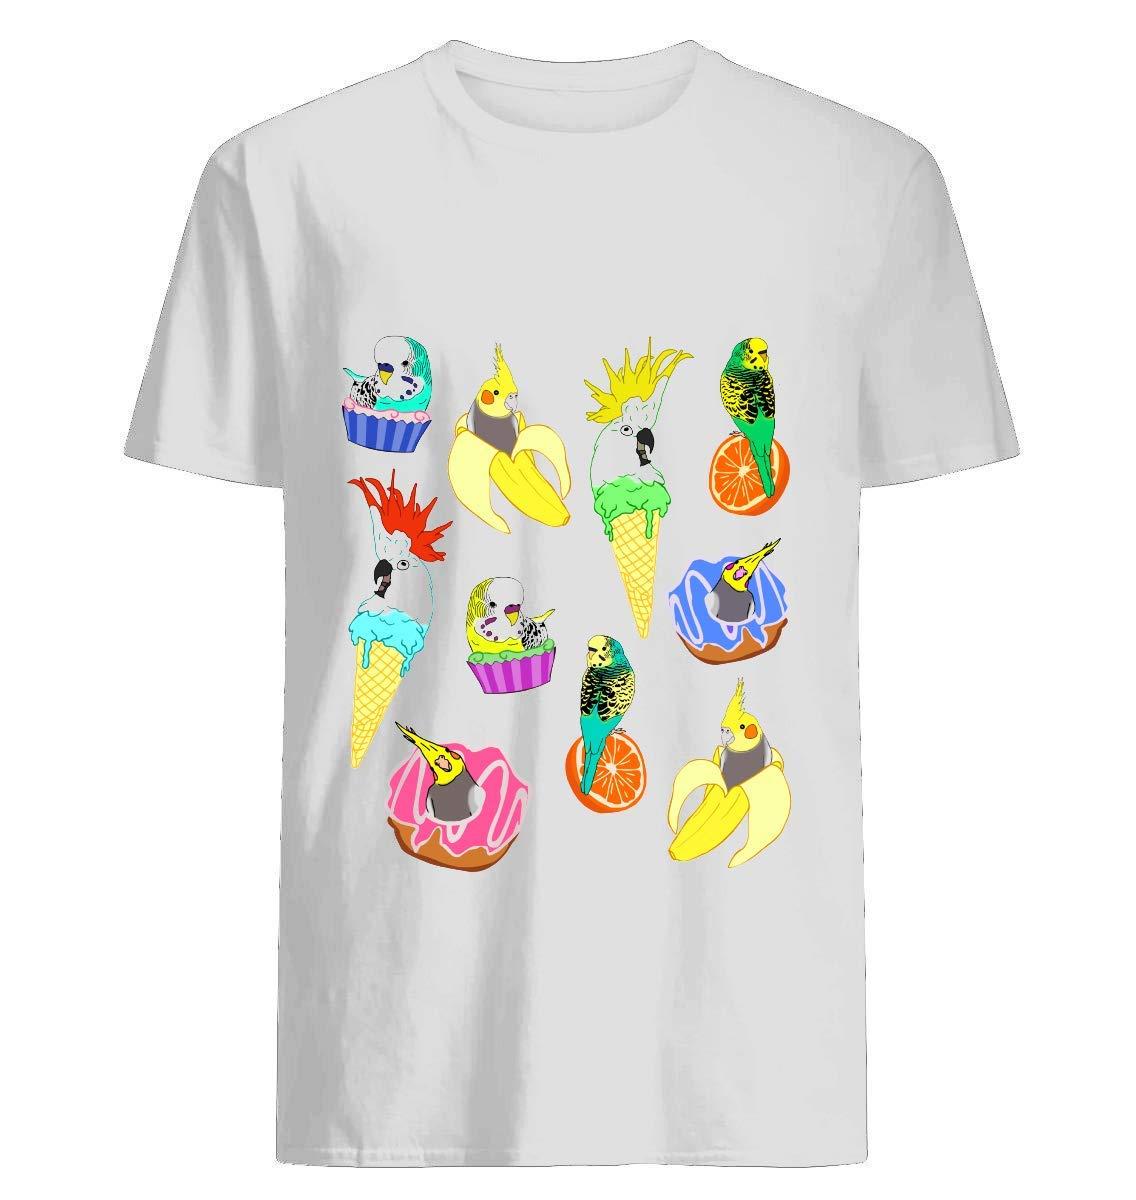 Food Birb Doodle Pattern 3 Shirts